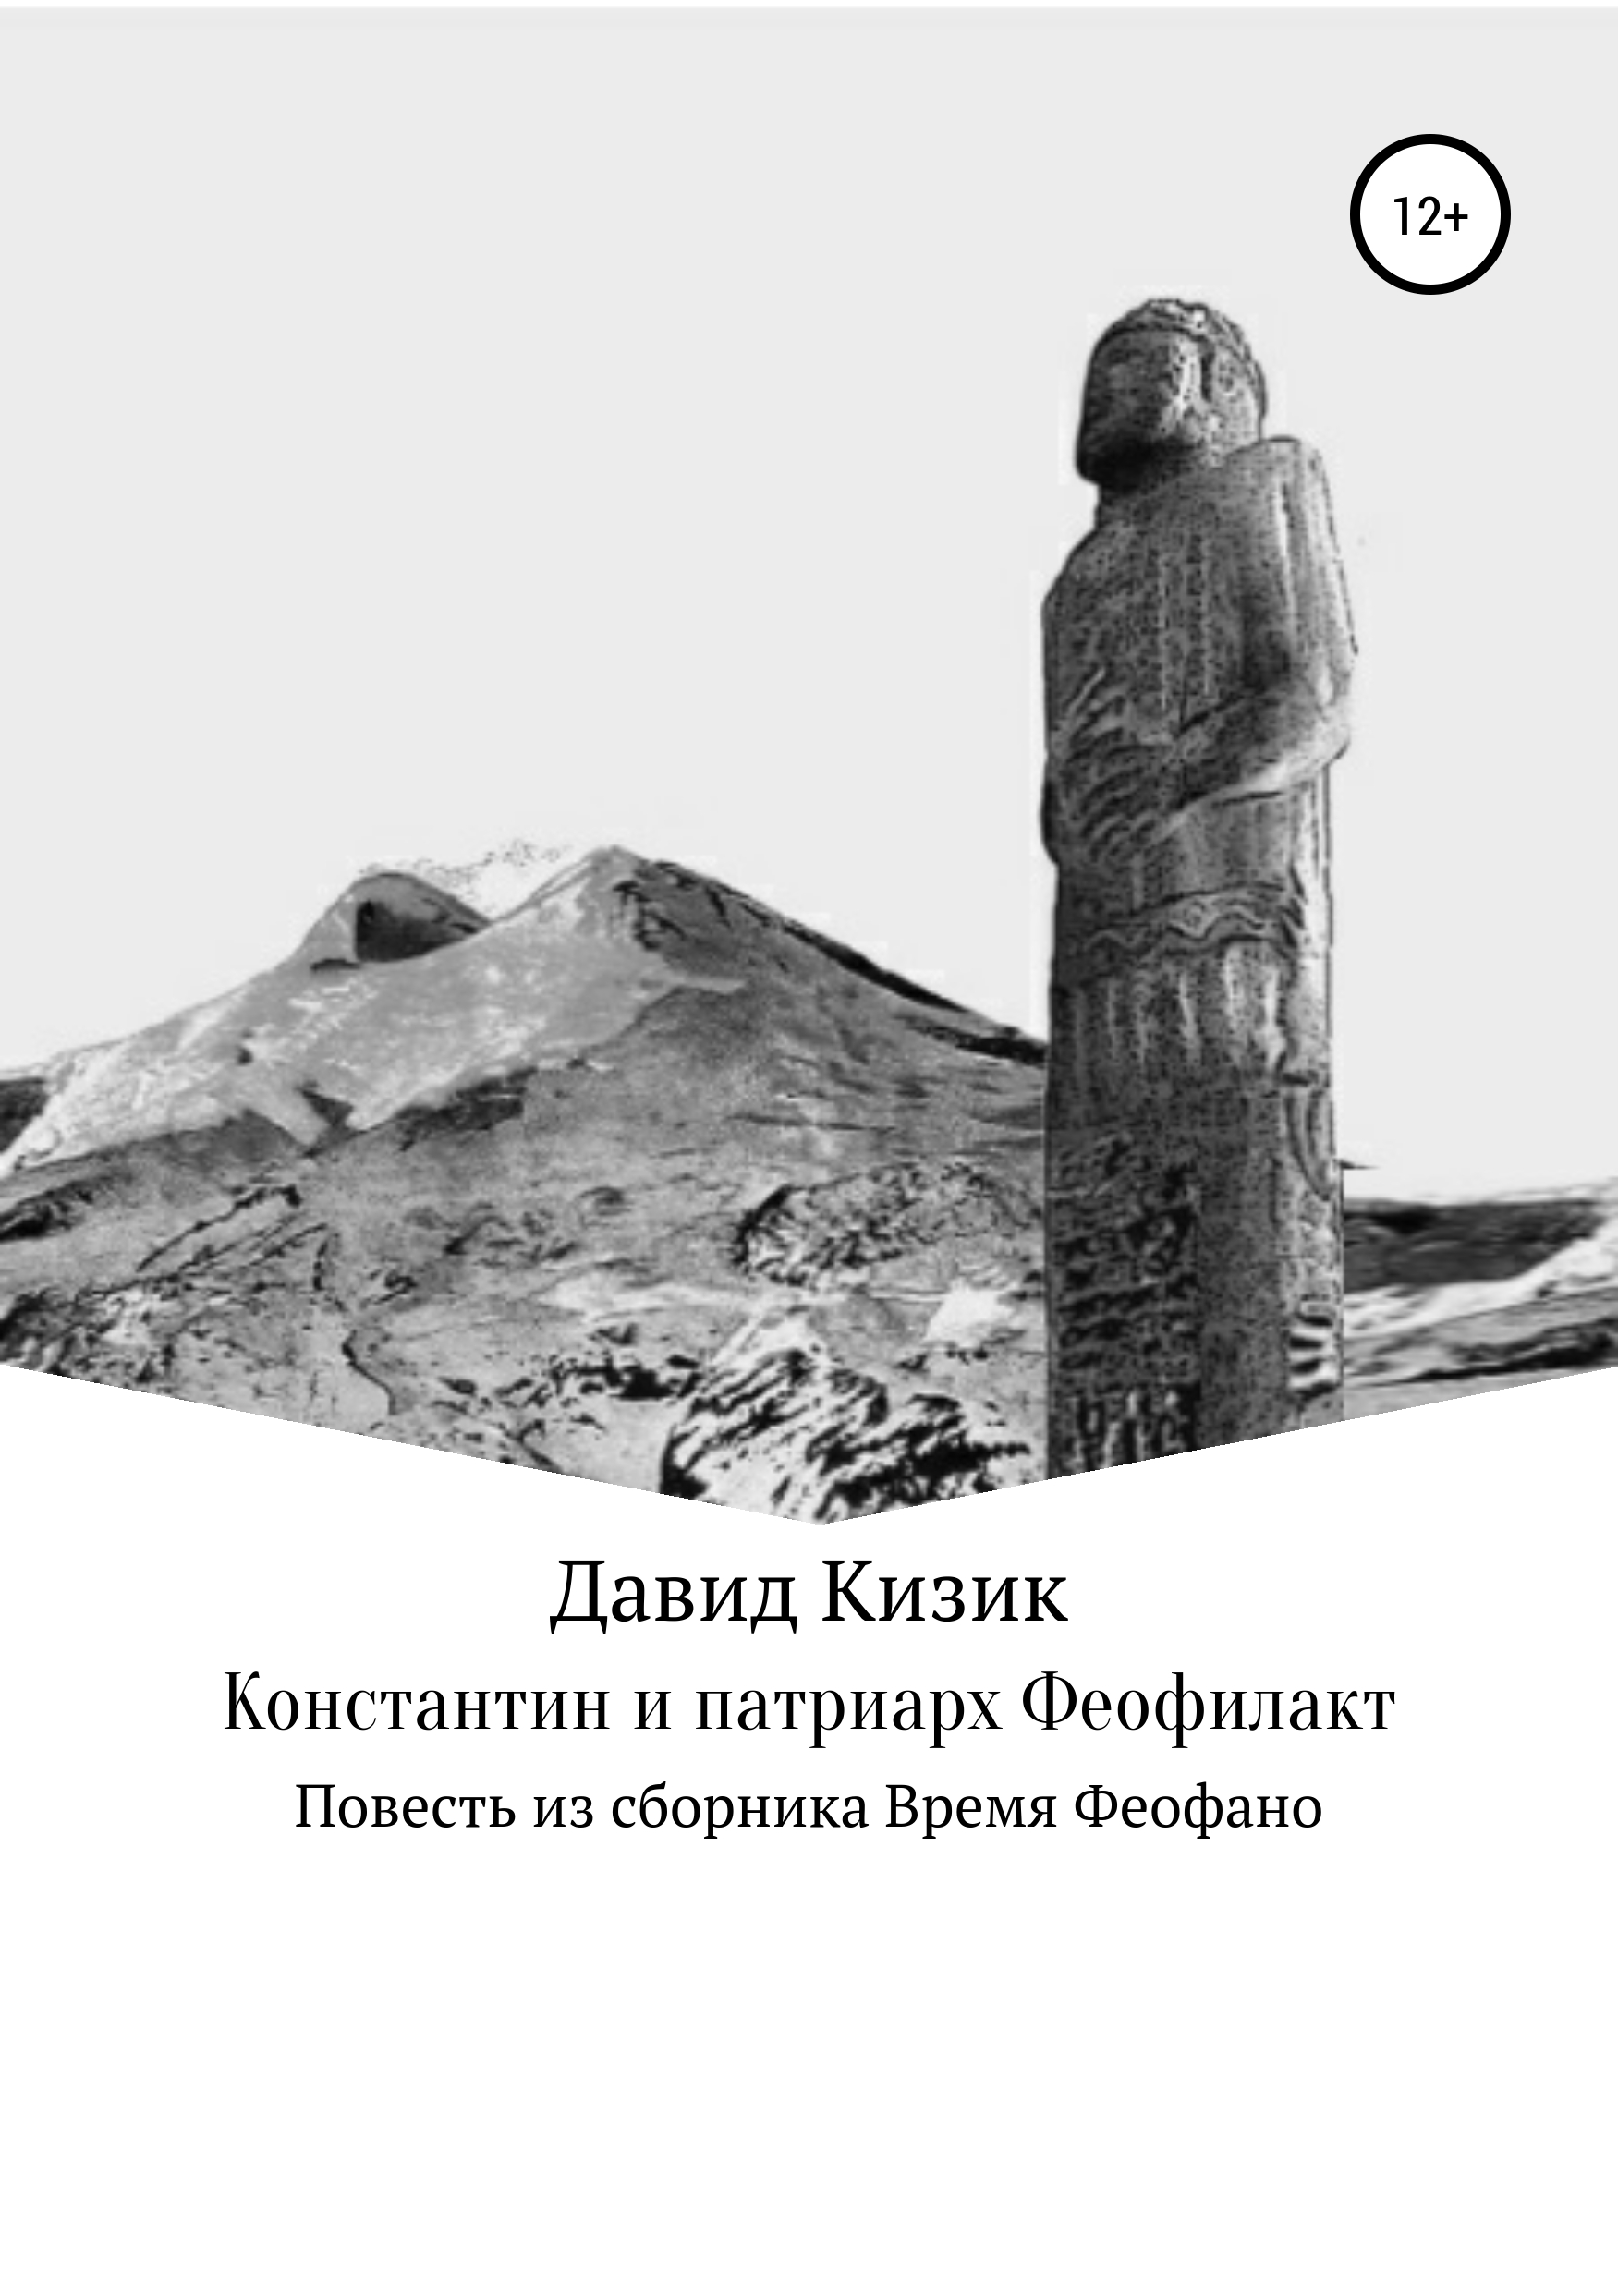 Давид Кизик Константин и патриарх Феофилакт давид кизик константин и наместница ольга